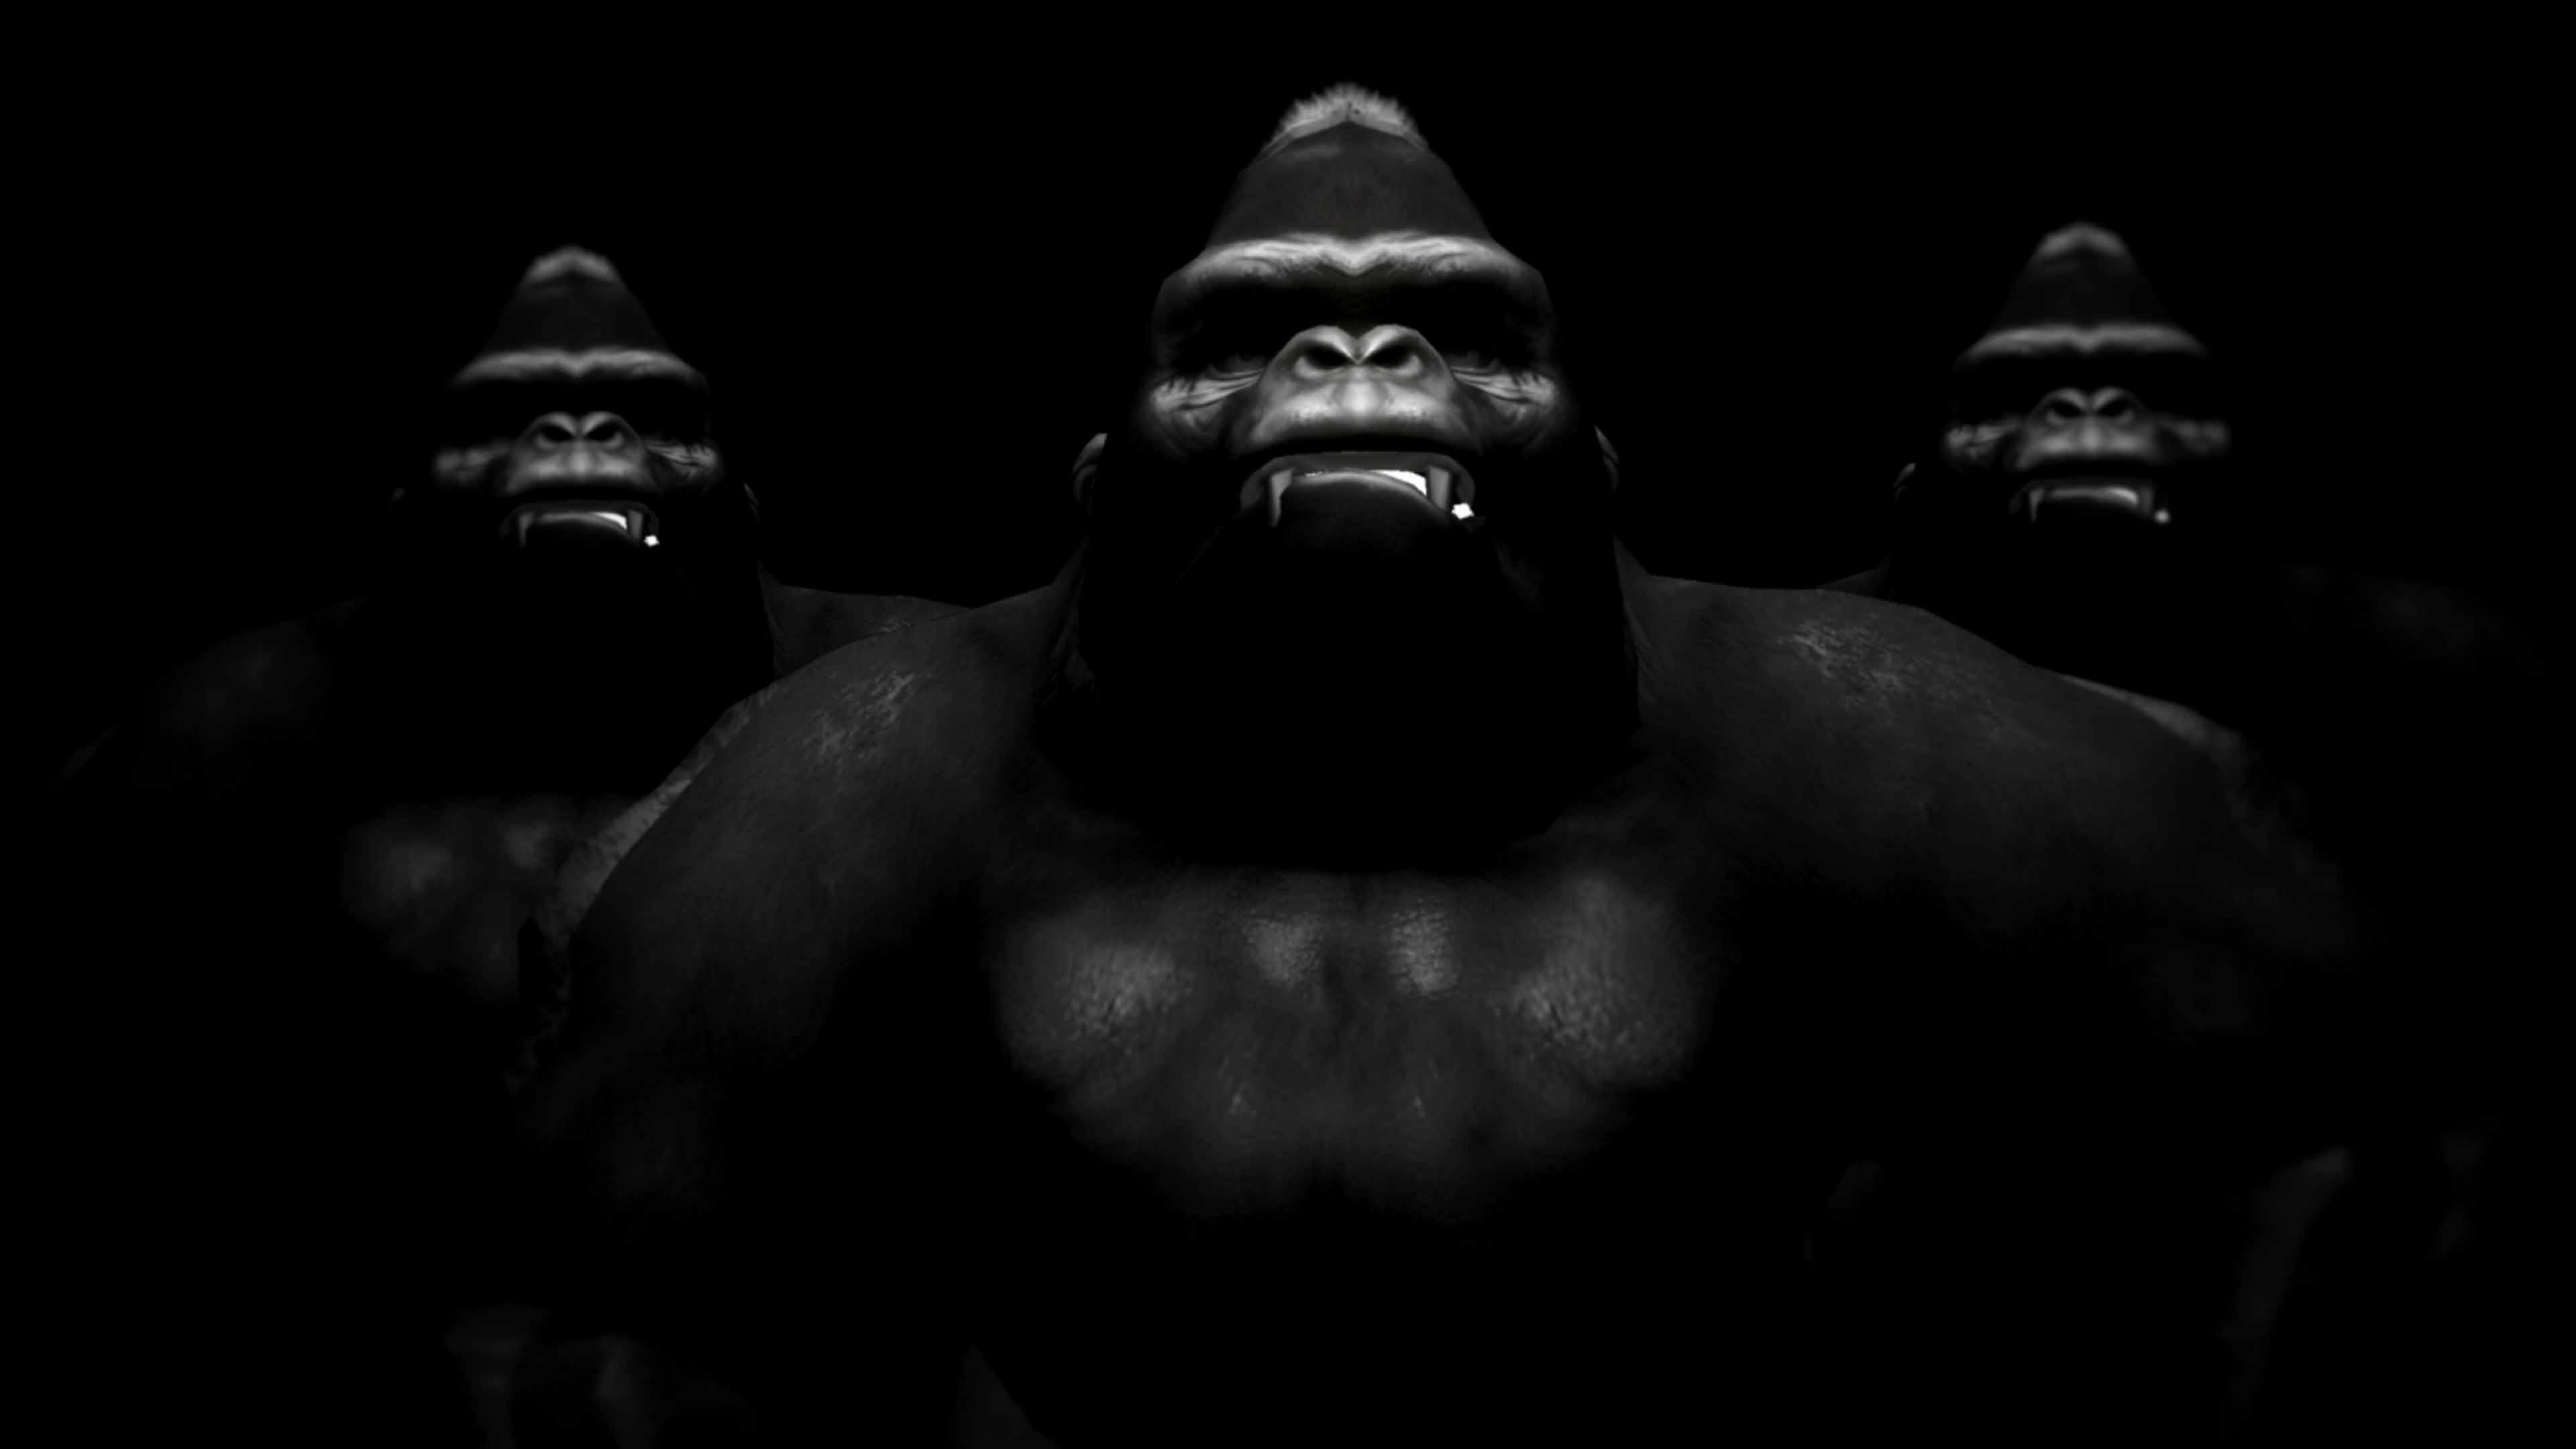 gorilla 3D animation